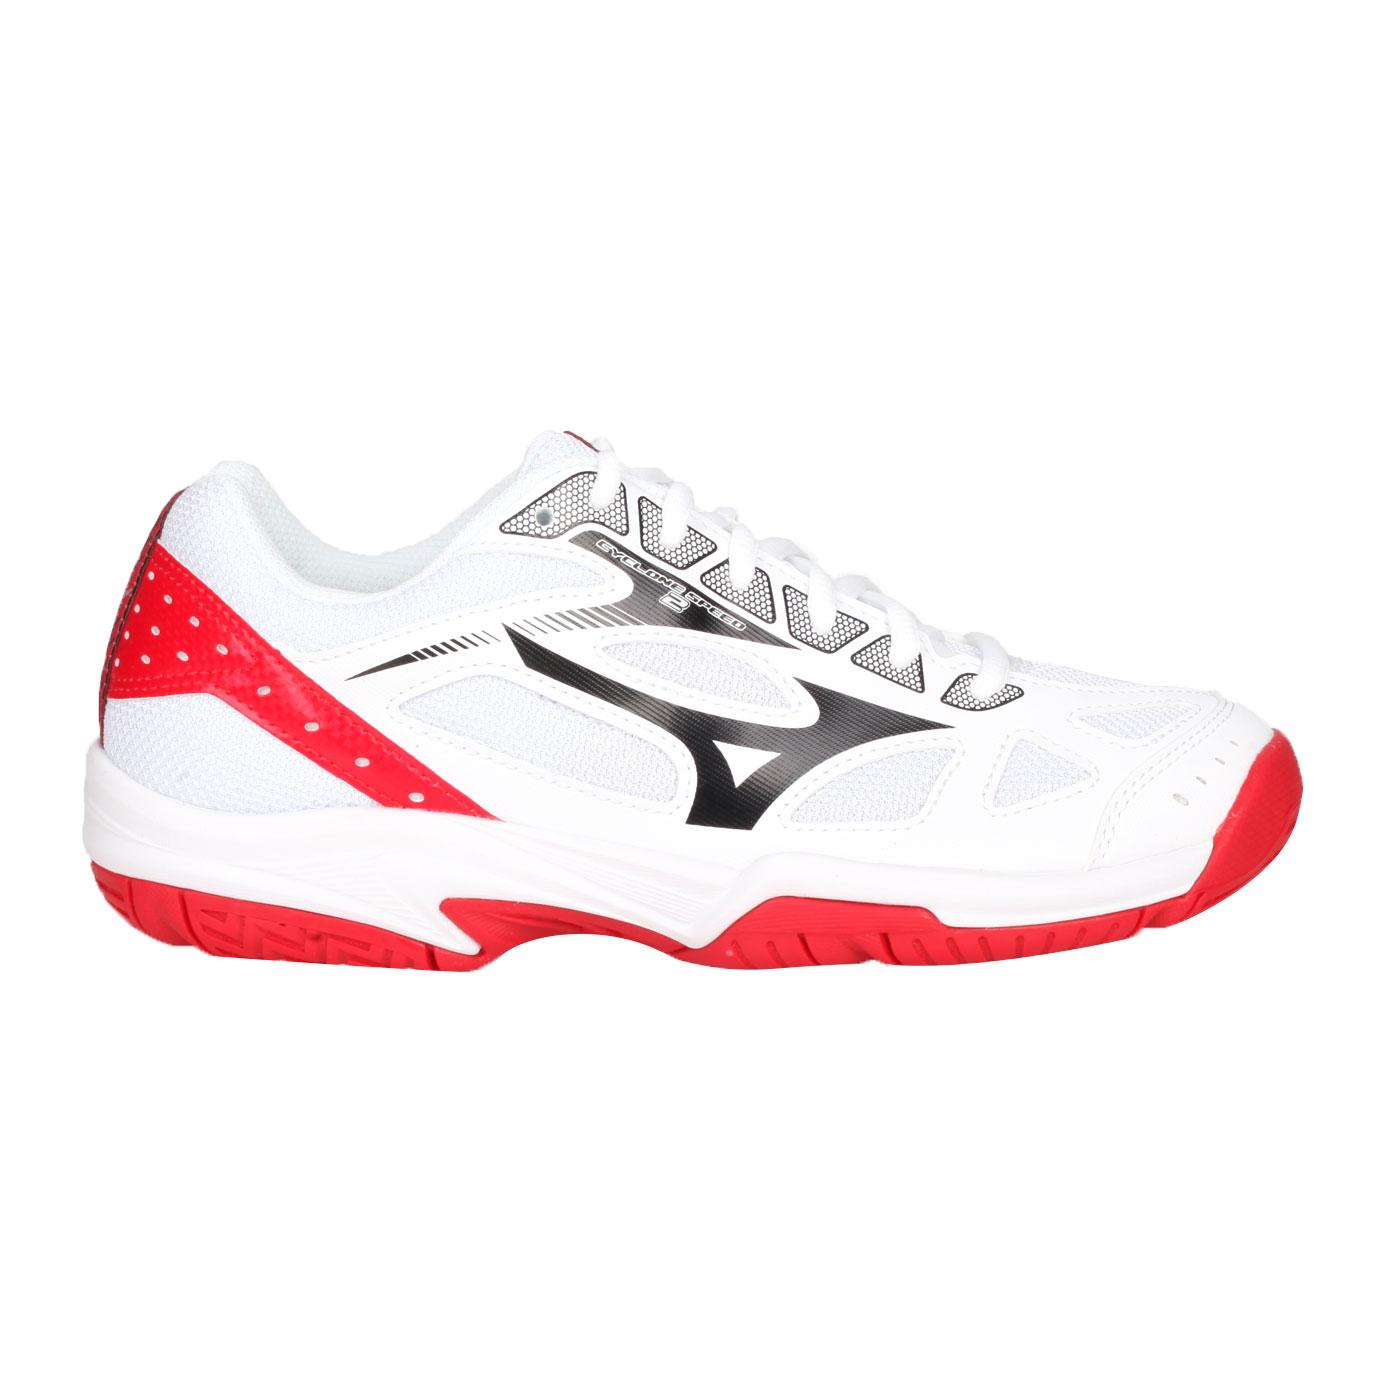 MIZUNO 排球鞋  @CYCLONE SPEED 2@V1GA198002 - 白黑紅